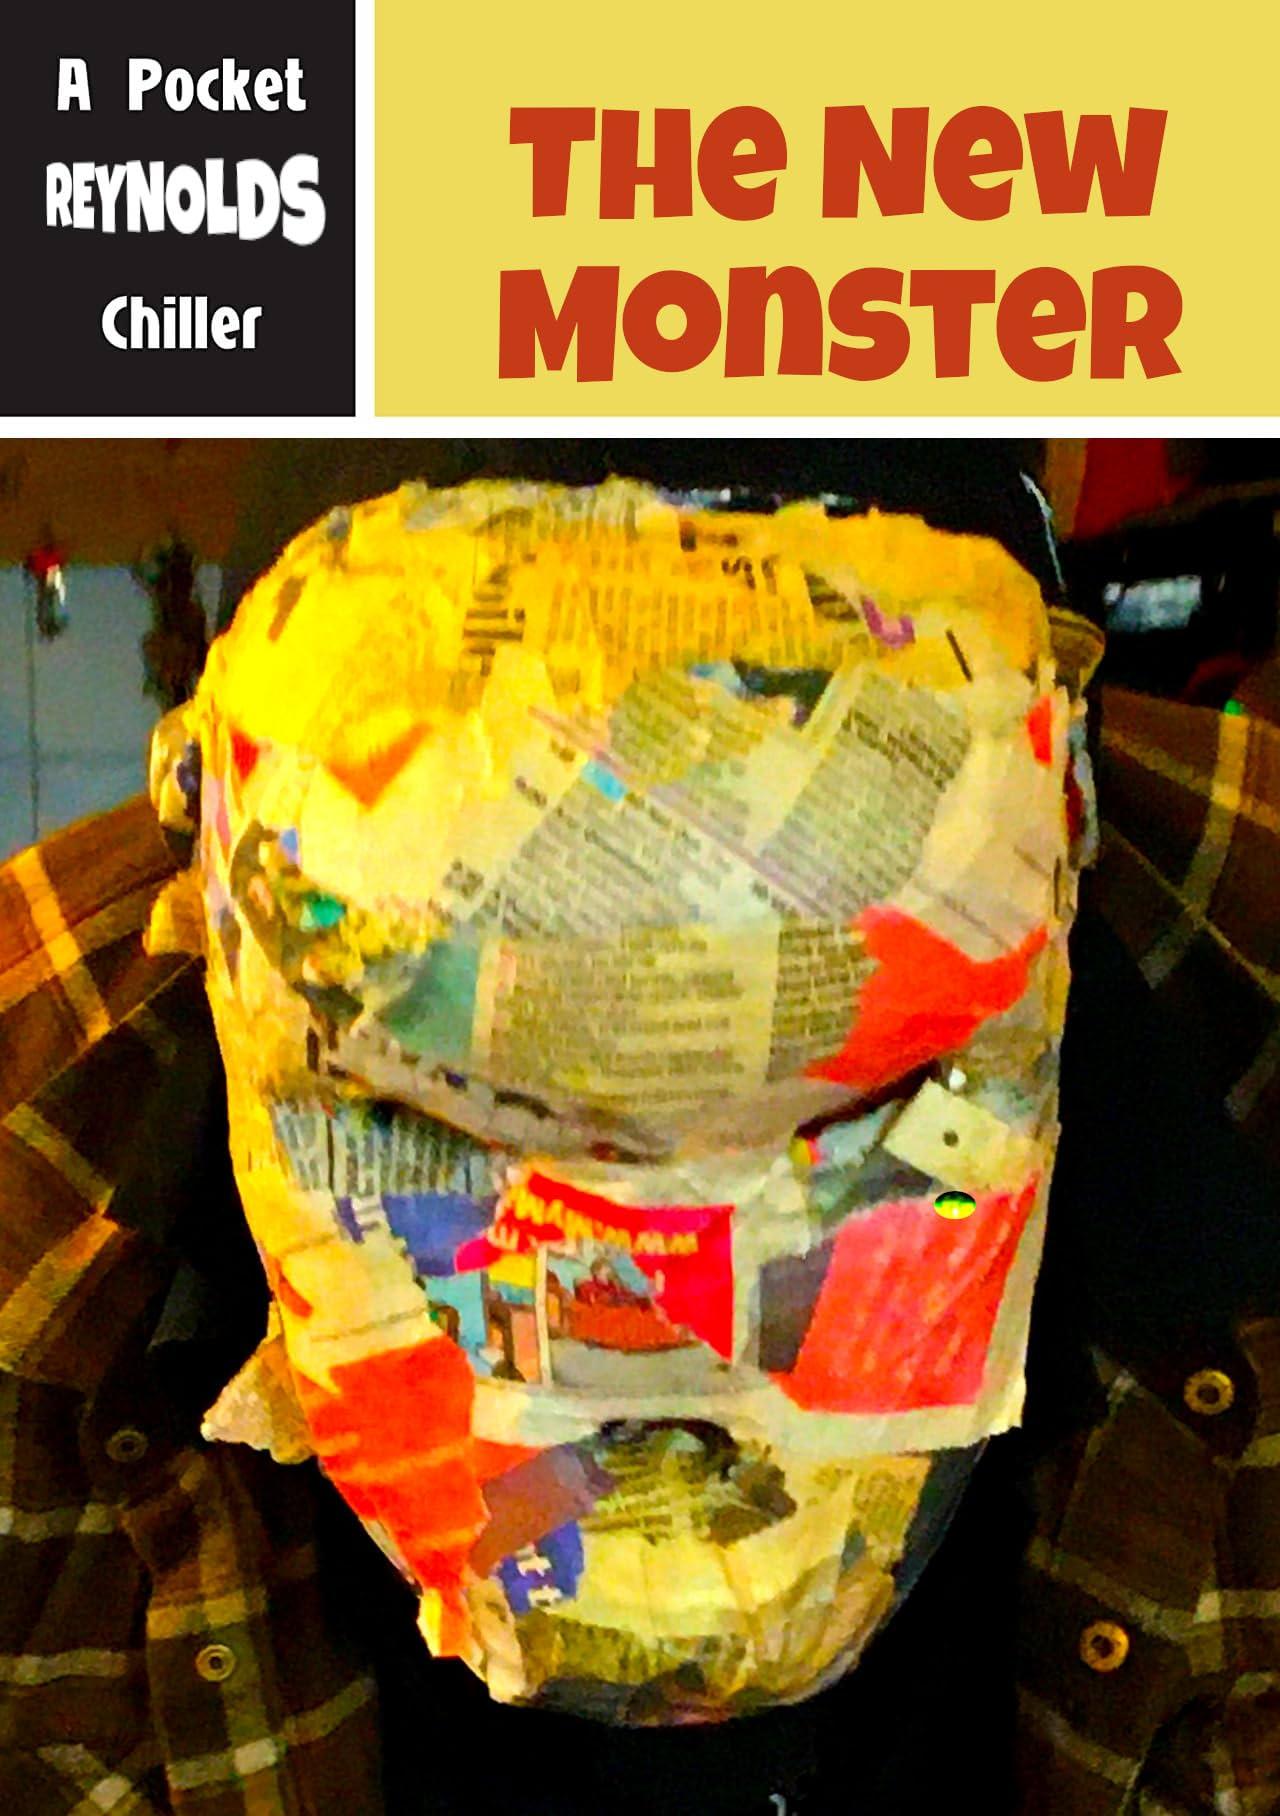 The New Monster